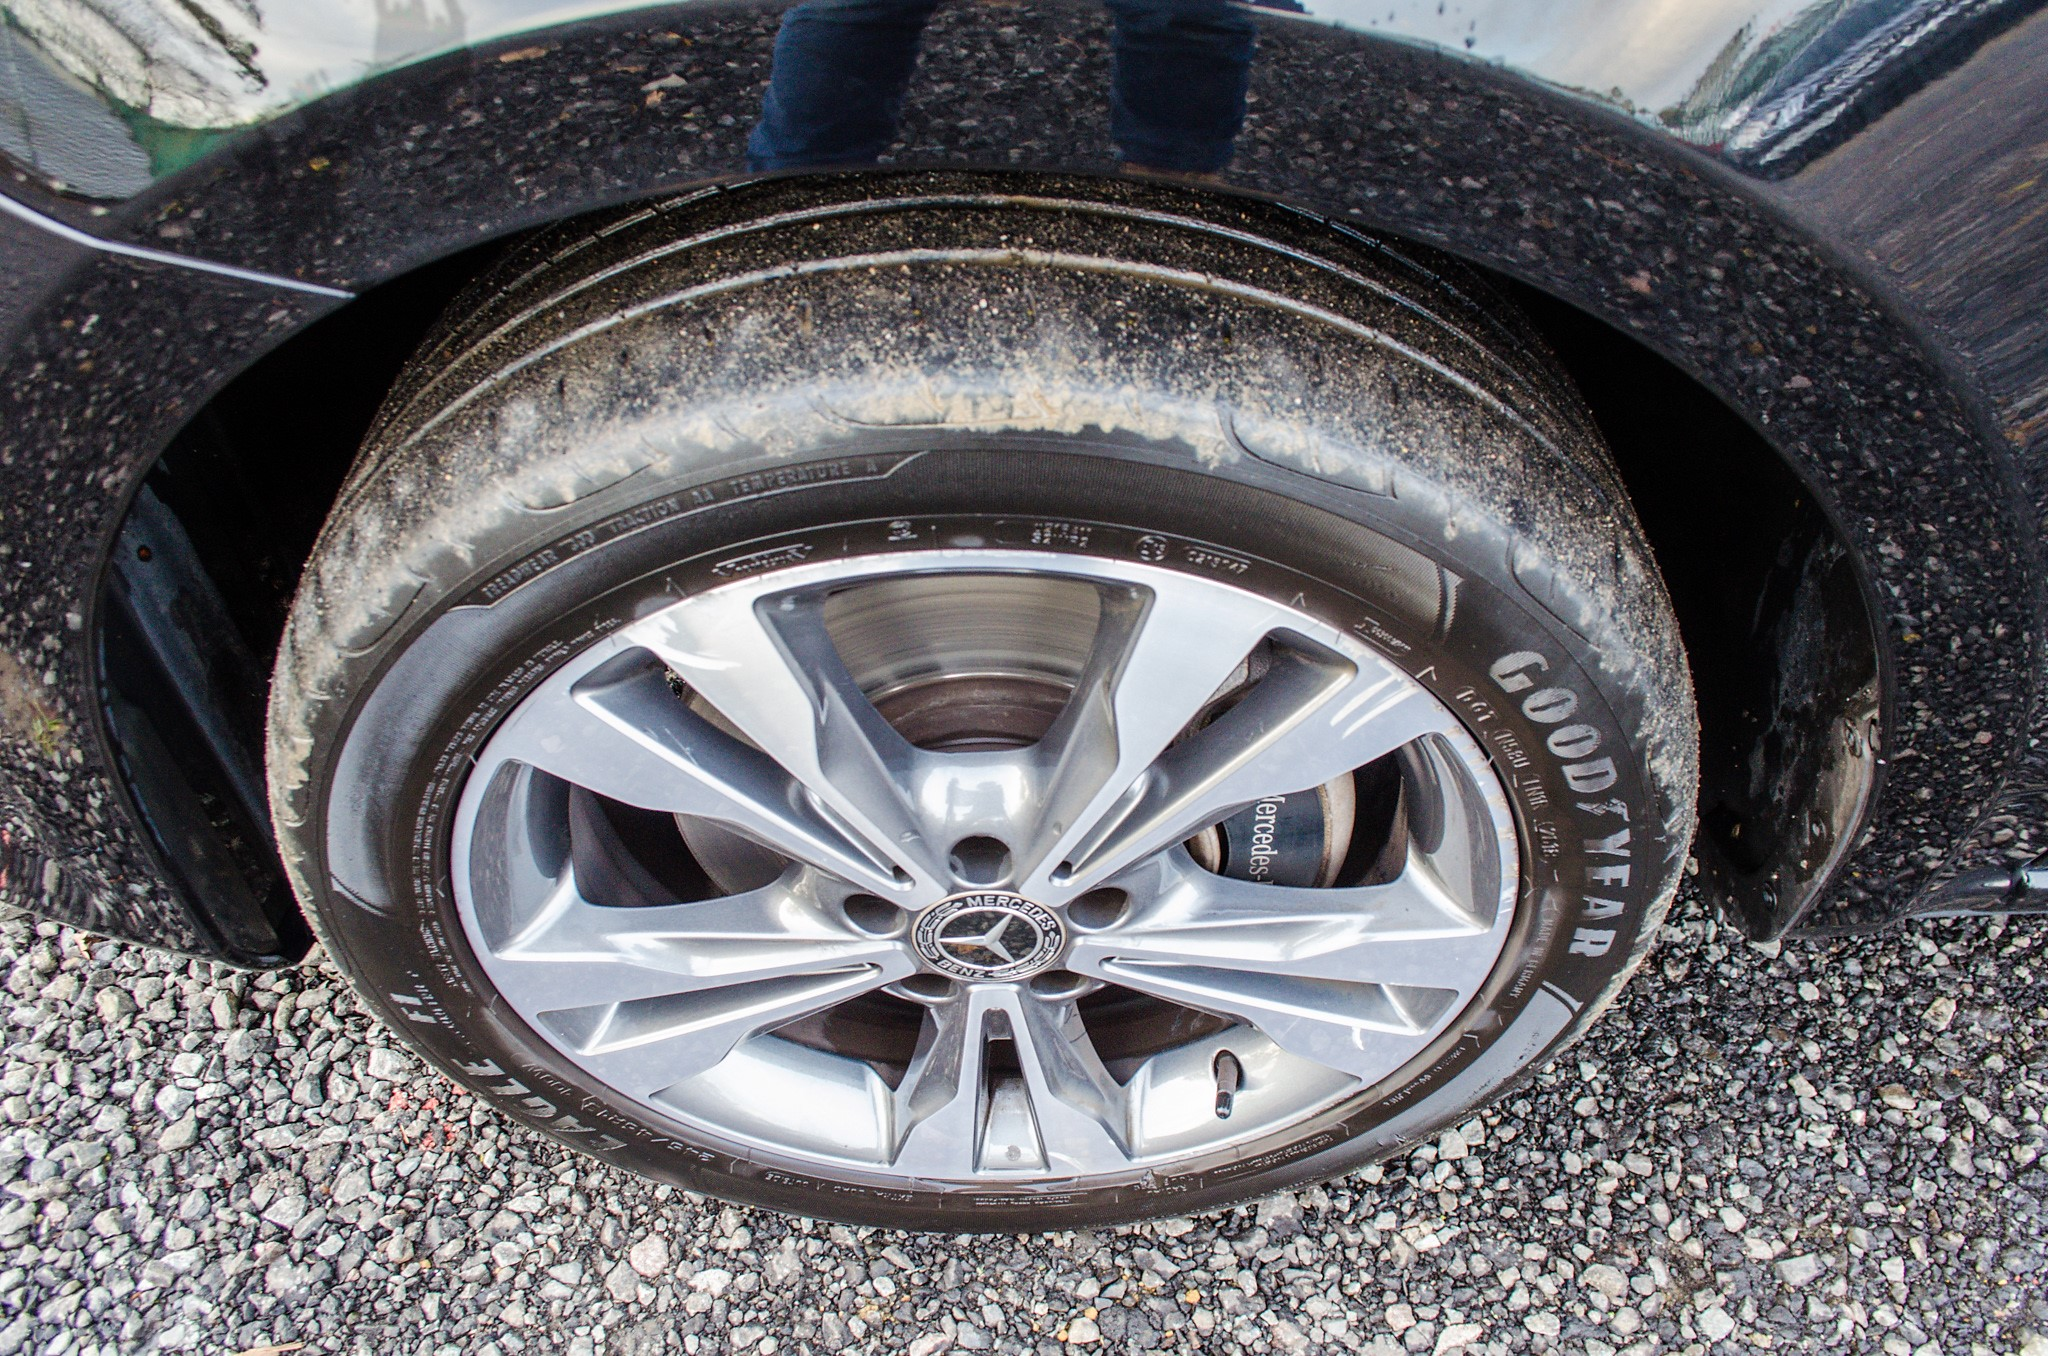 Mercedes Benz V250 Sport Bluetec XLWB auto diesel 8 seat MPV Reg No: FY68 JTO Date of First - Image 14 of 27